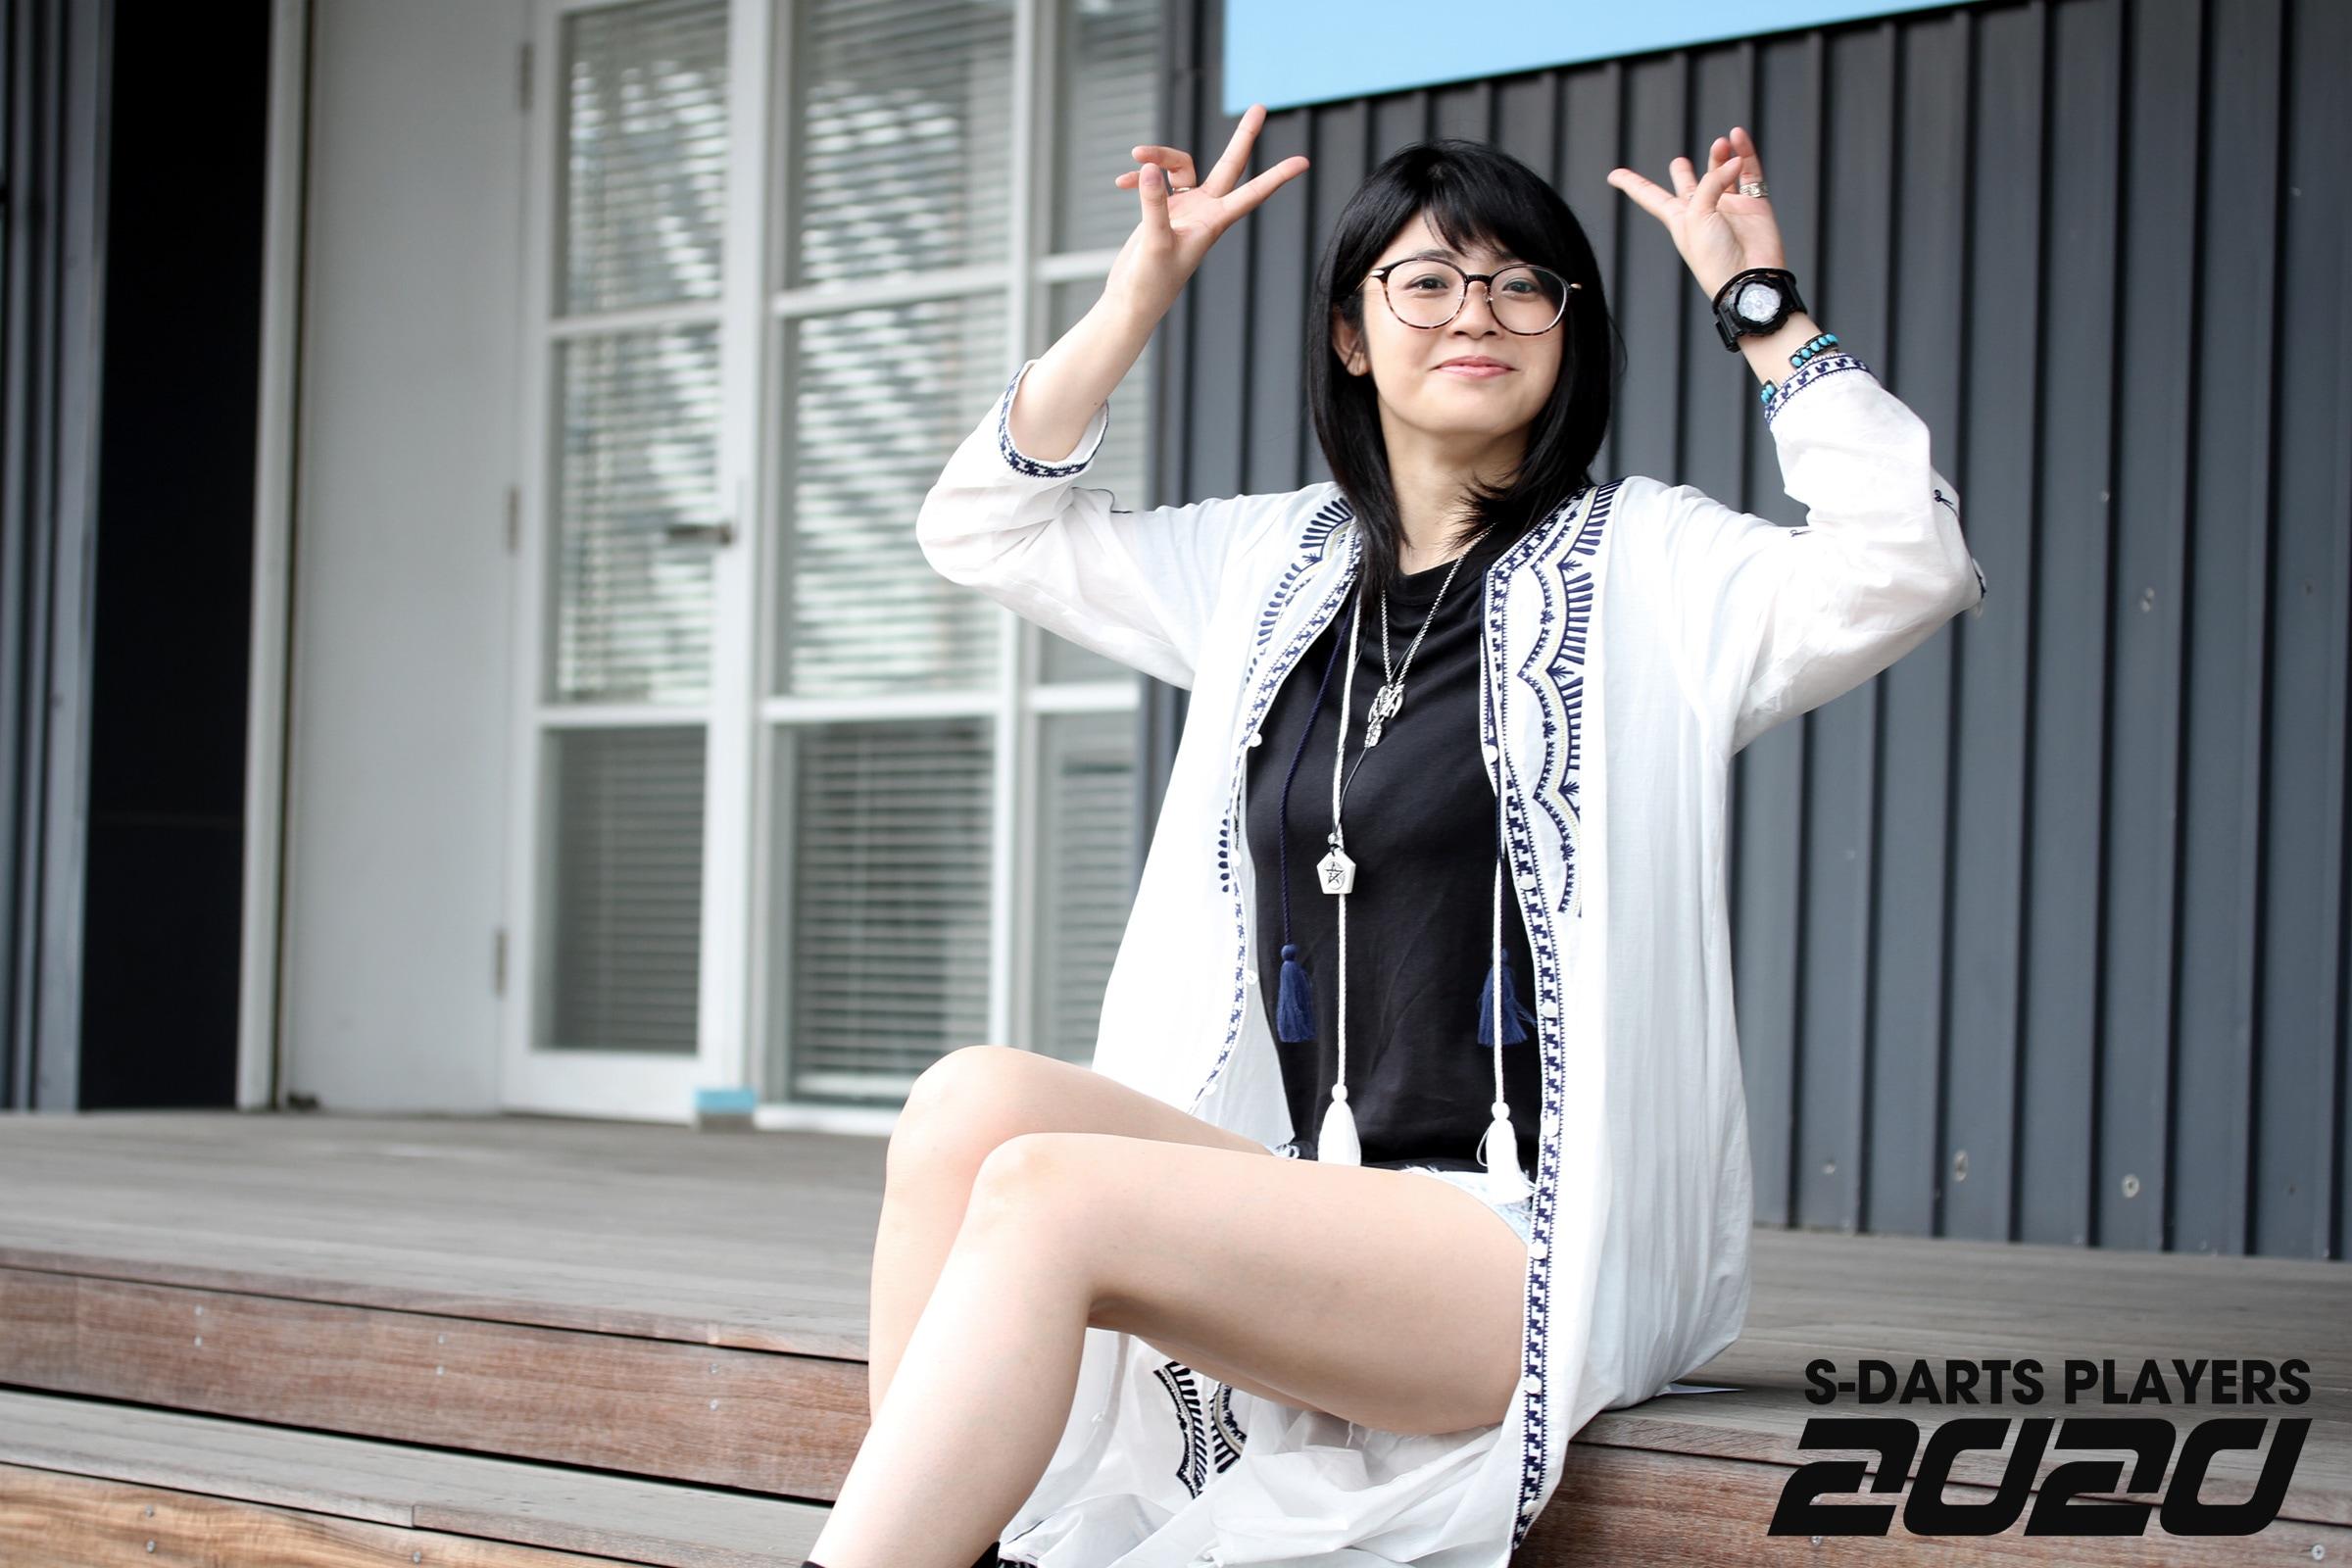 S-DARTS PLAYERS 2020│坂口優希恵